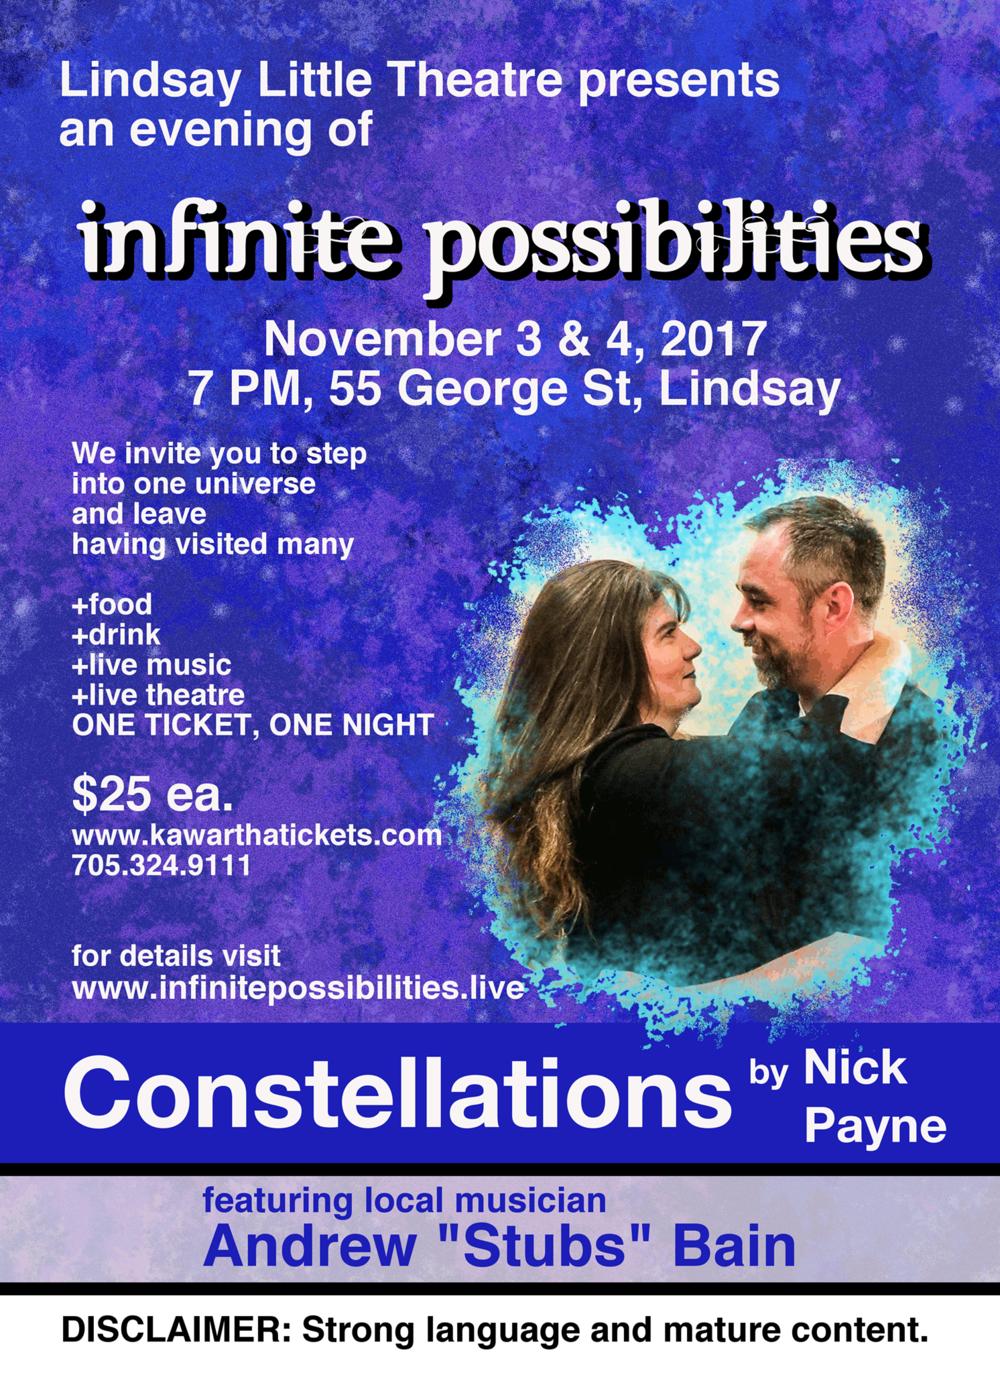 constellations-3.jpg